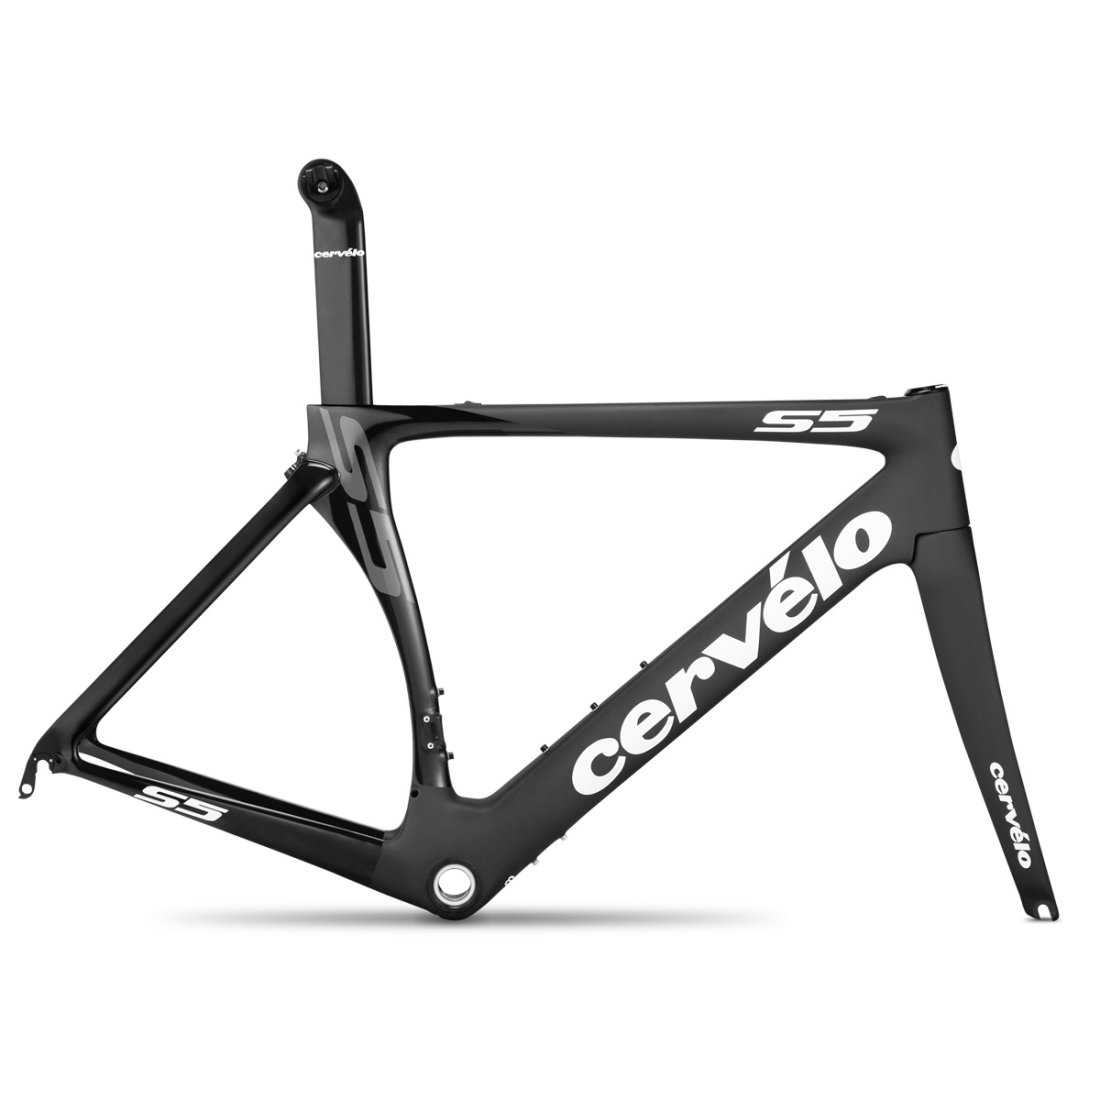 Cuadro bicicleta CERVELO S5 Black / White · Motocard